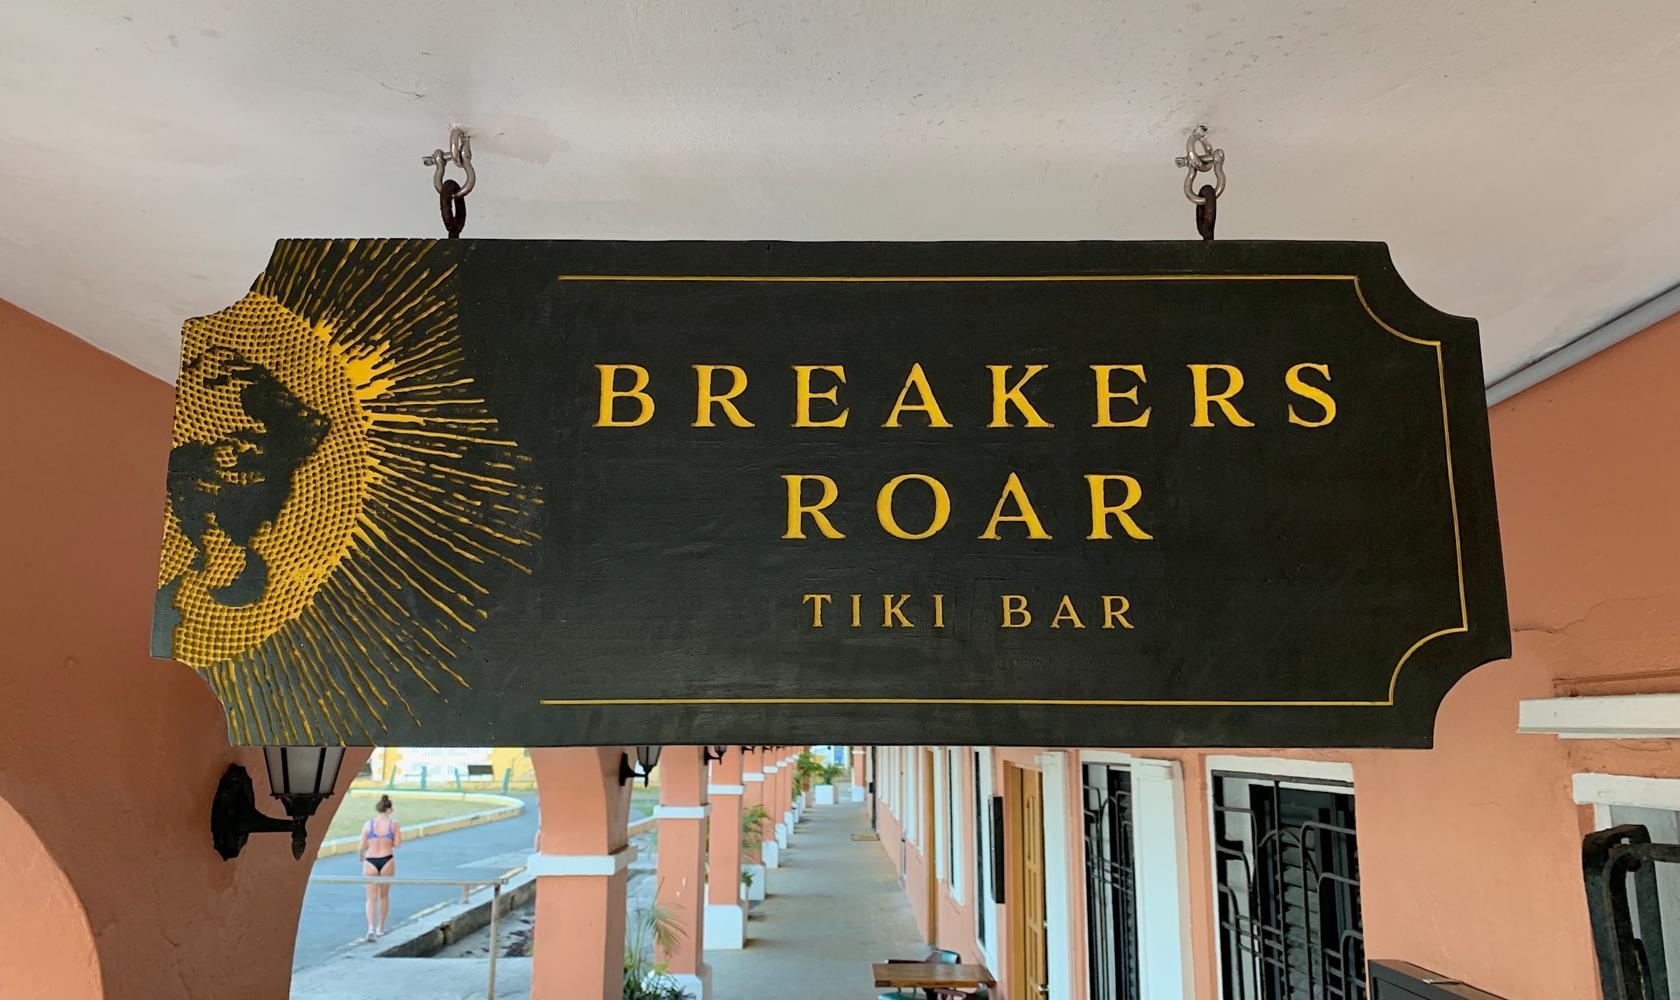 Breakers Roar Tiki Bar - entry sign